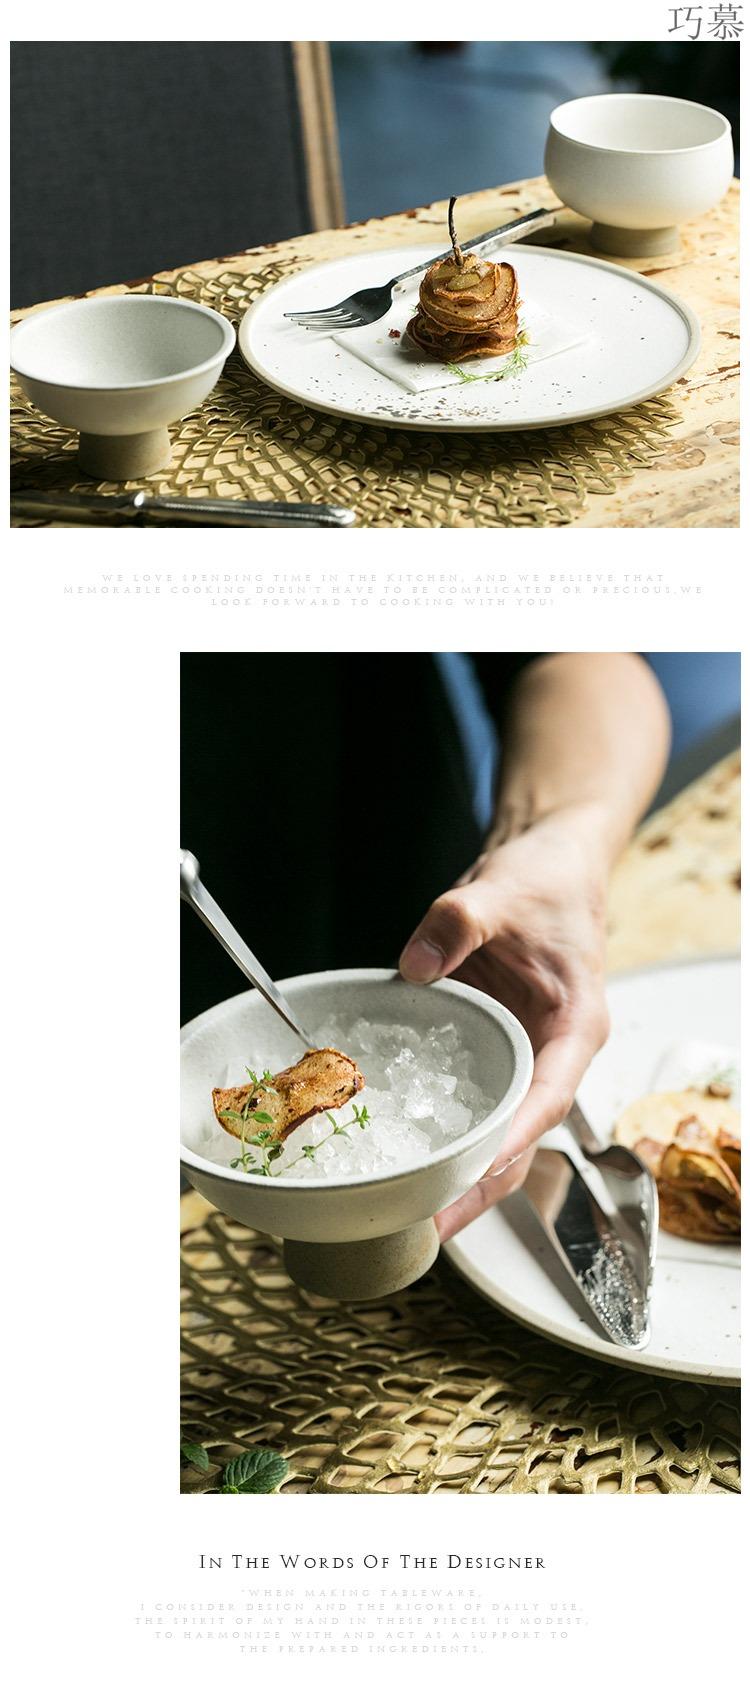 Qiao mu DY creative ceramic disc beefsteak plate household fruit bowl restaurant tableware dish dish dessert dish plates